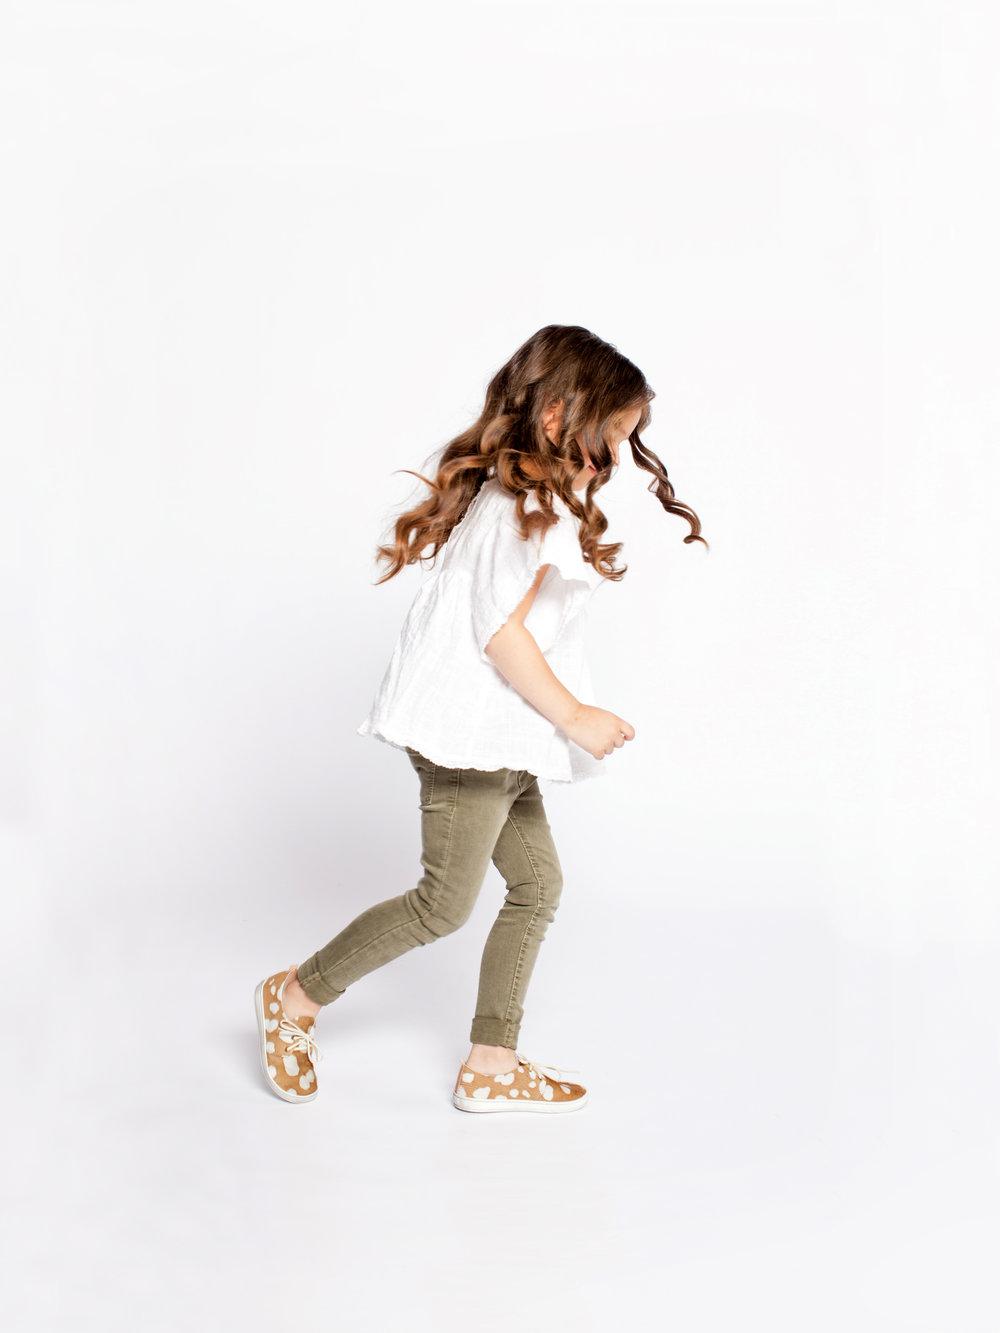 heather-moore-nyc-fashion-photographer.jpg